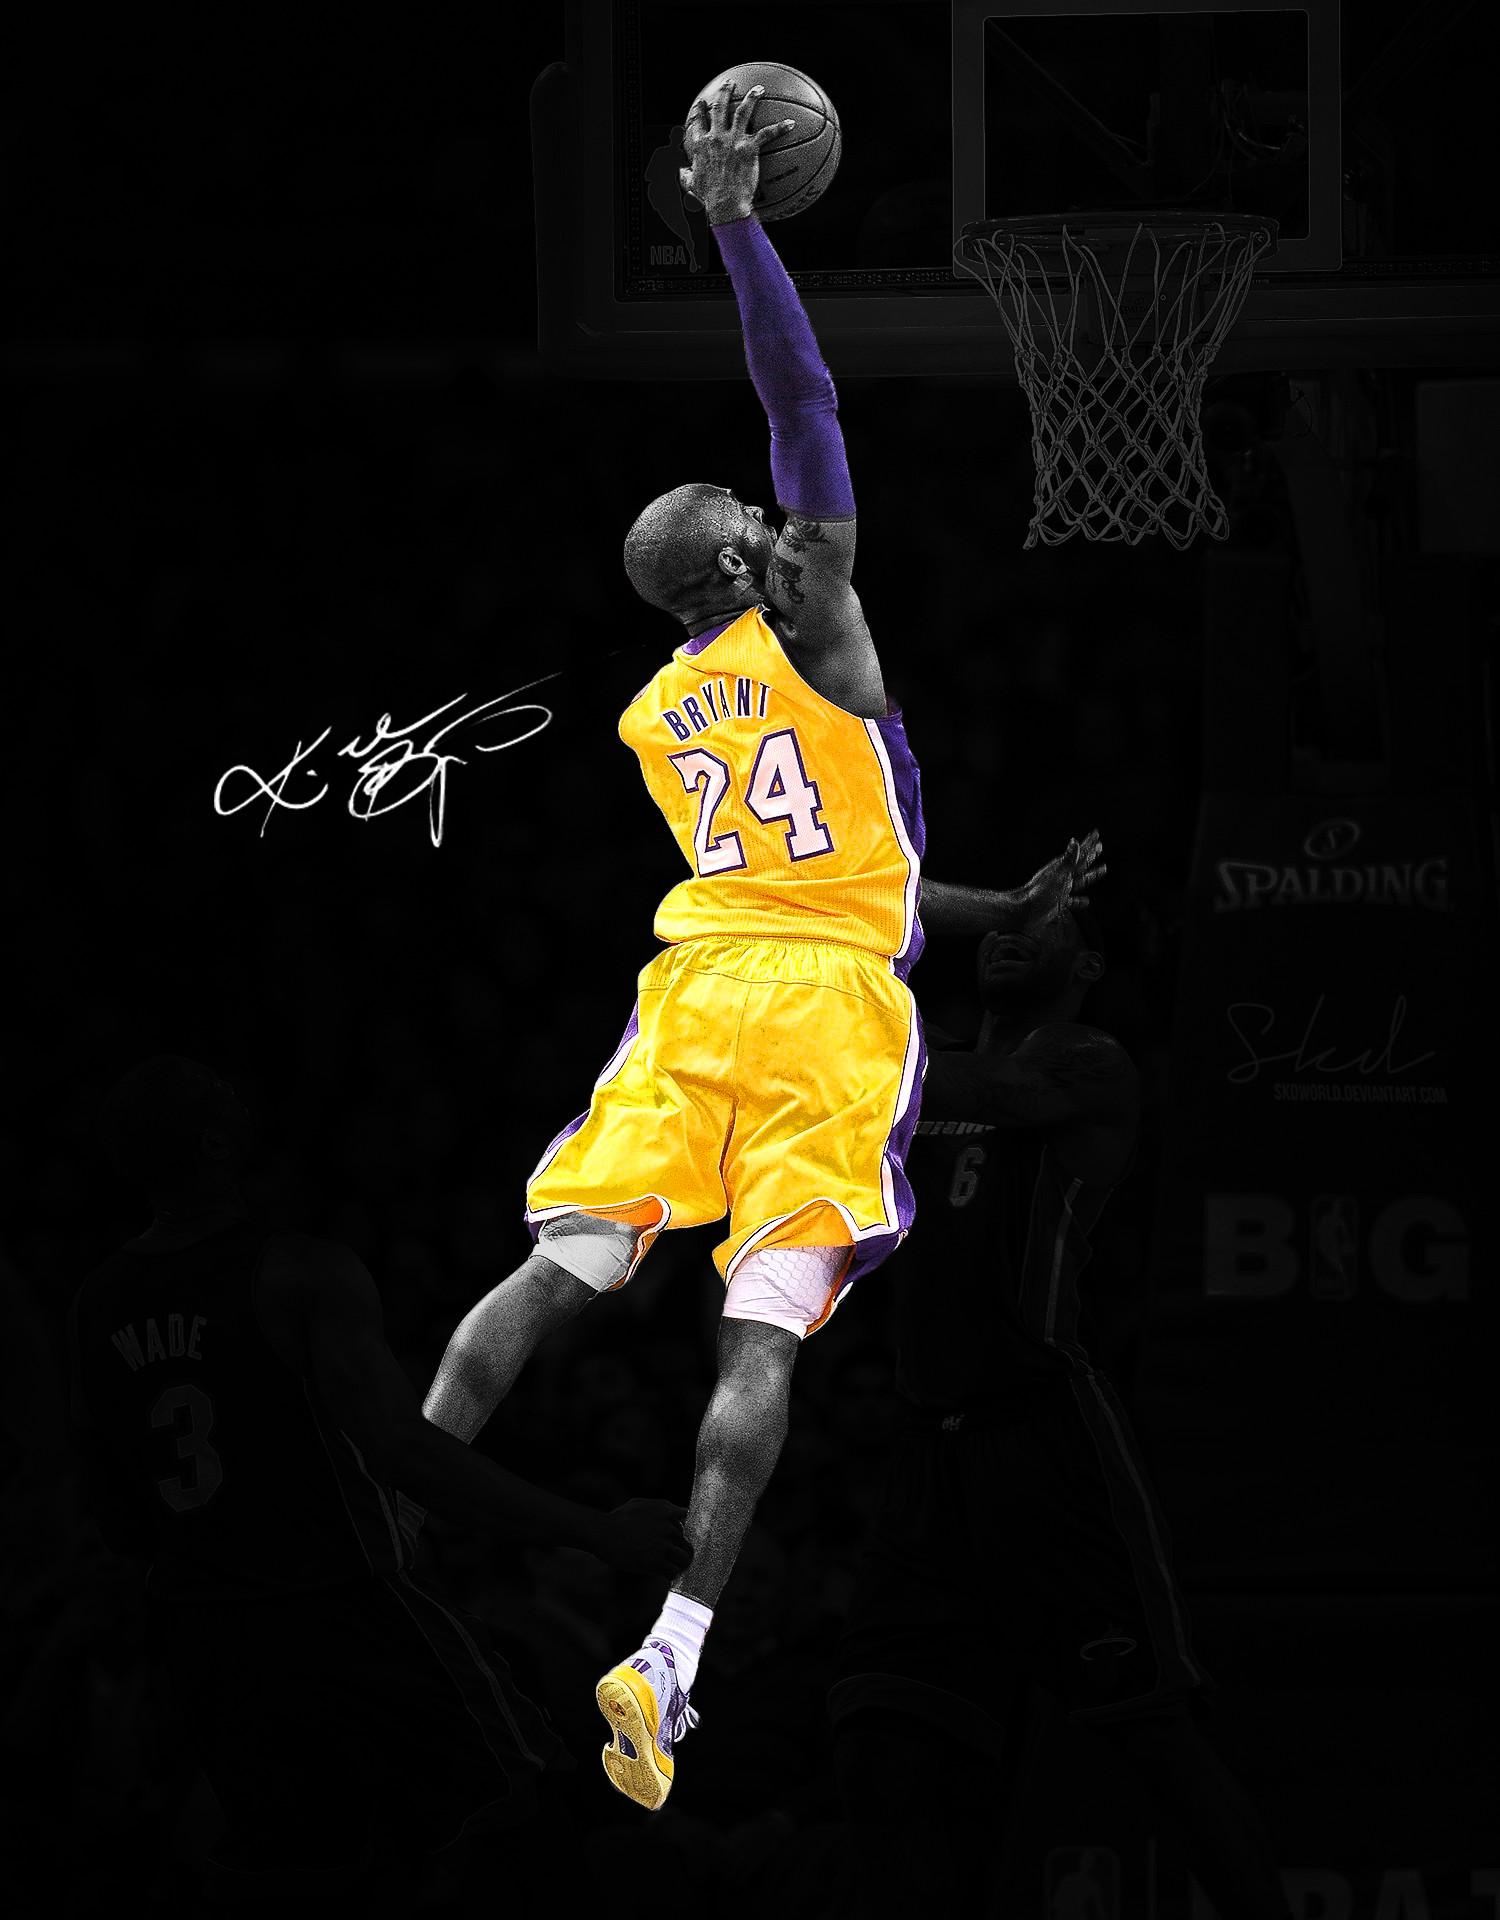 Nike kobe wallpaper wallpapertag - Kobe bryant wallpaper free download ...